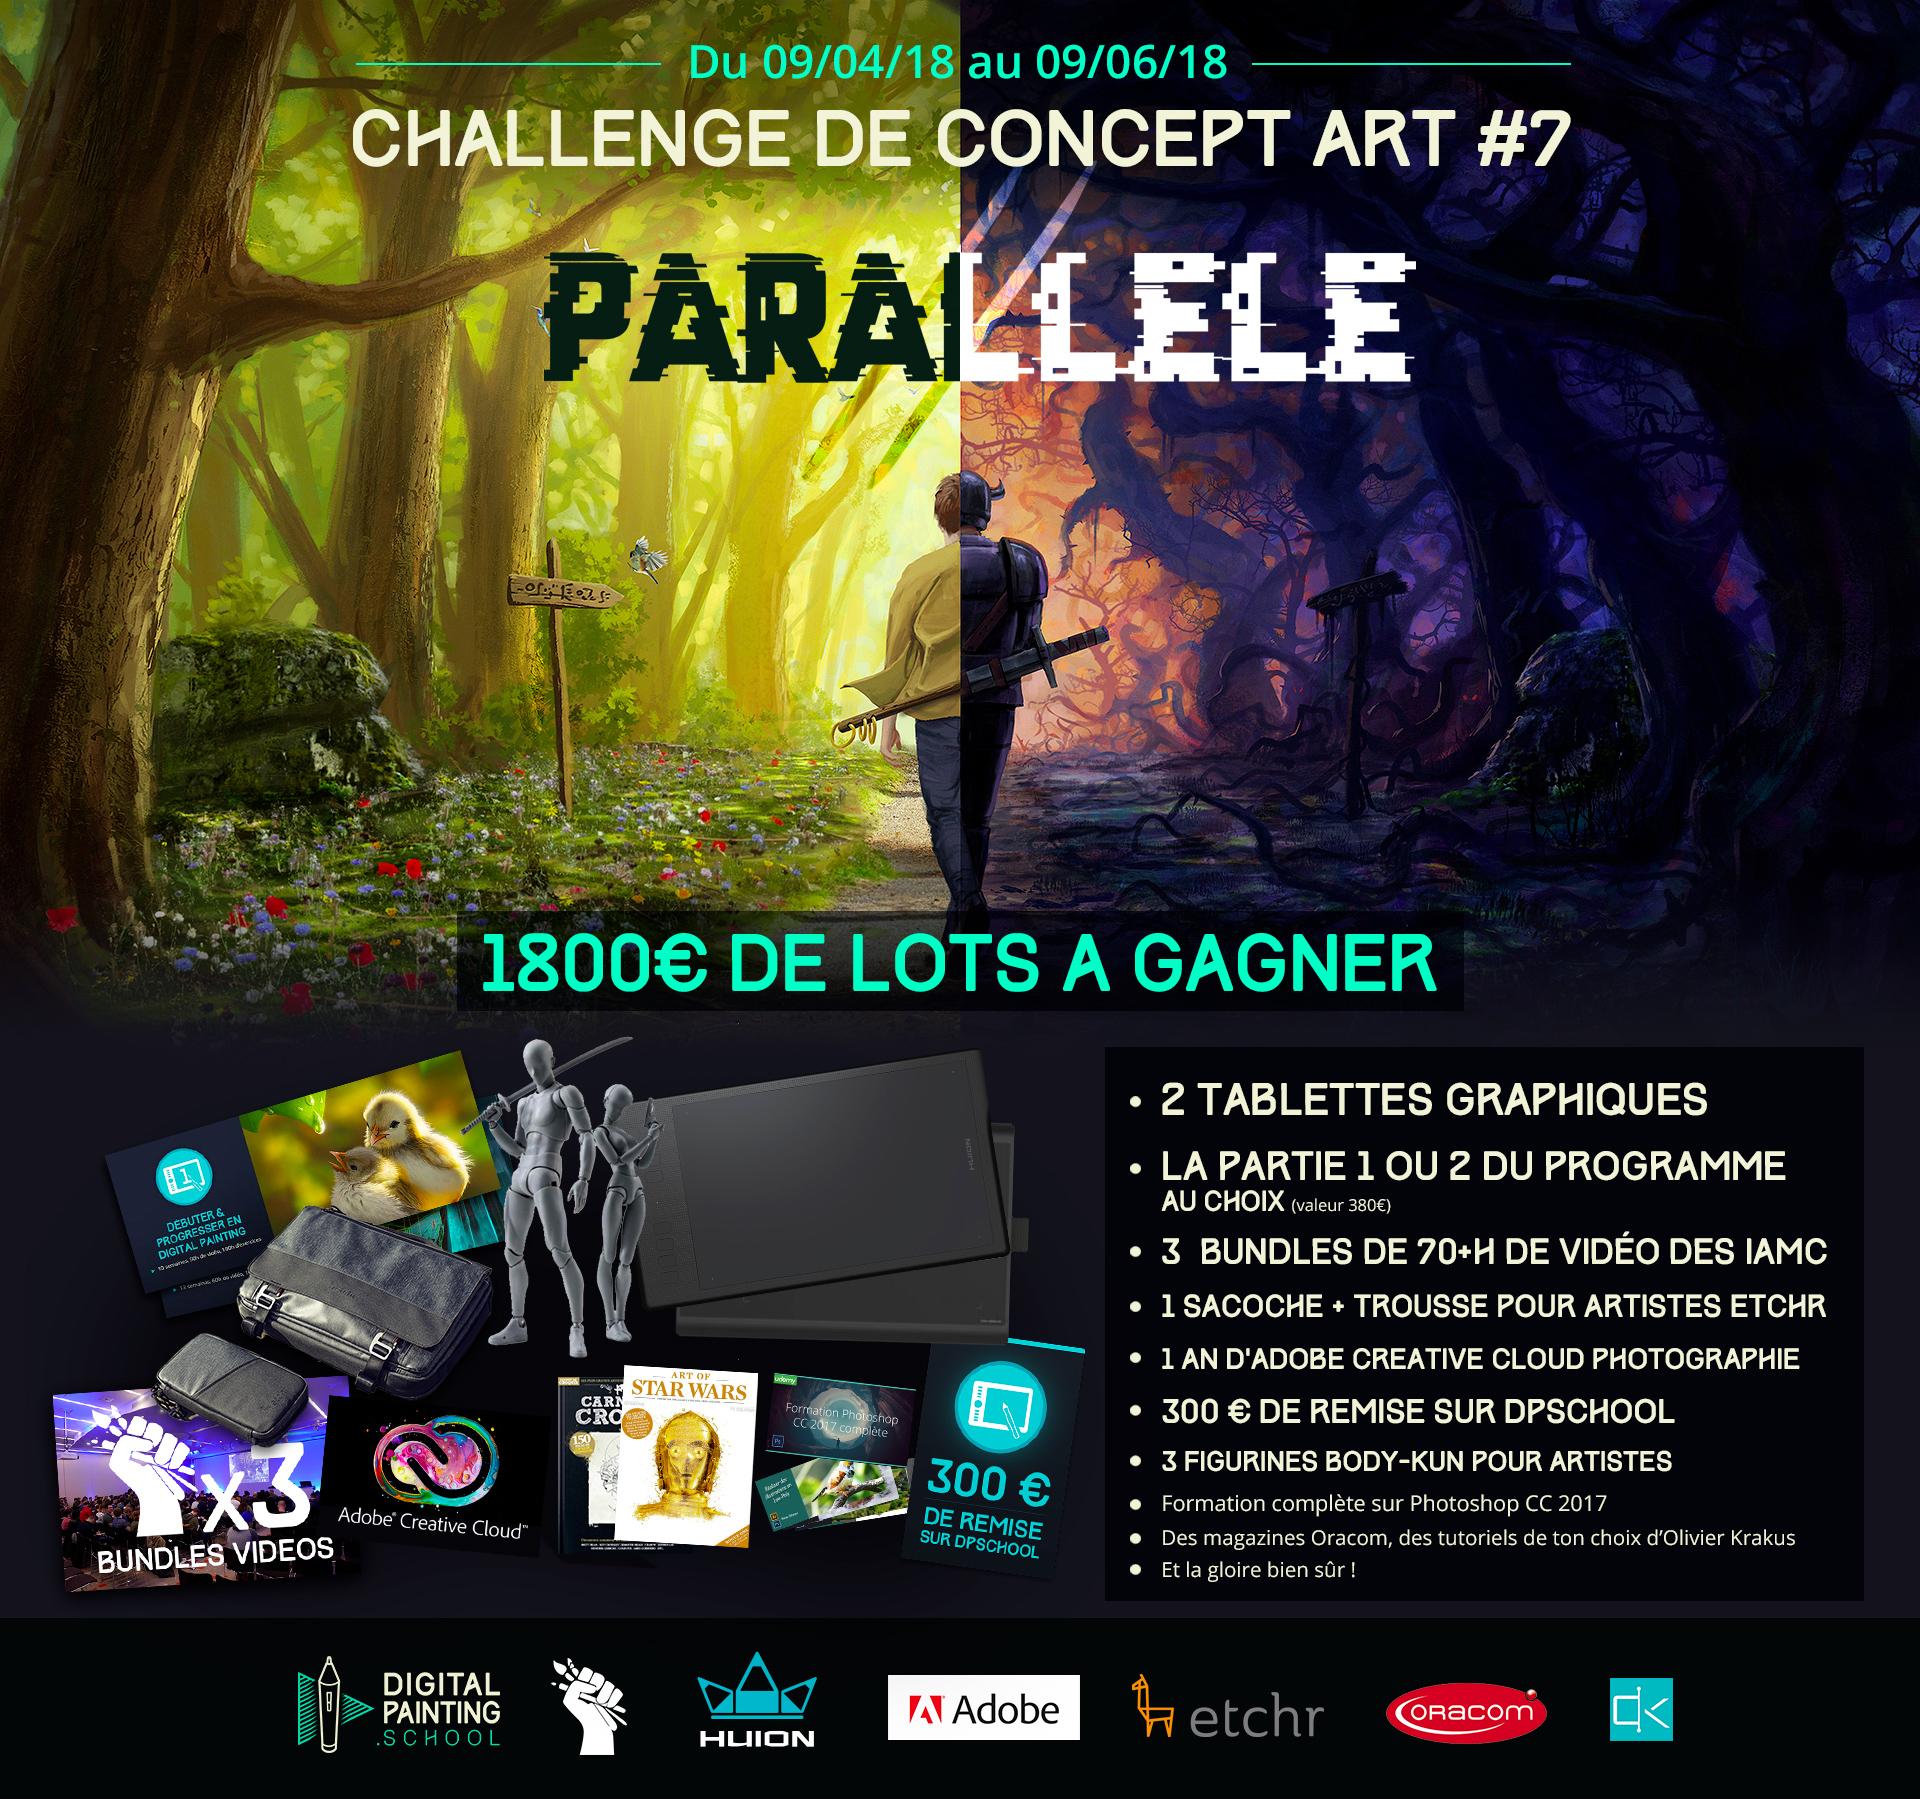 Challenge digital painting